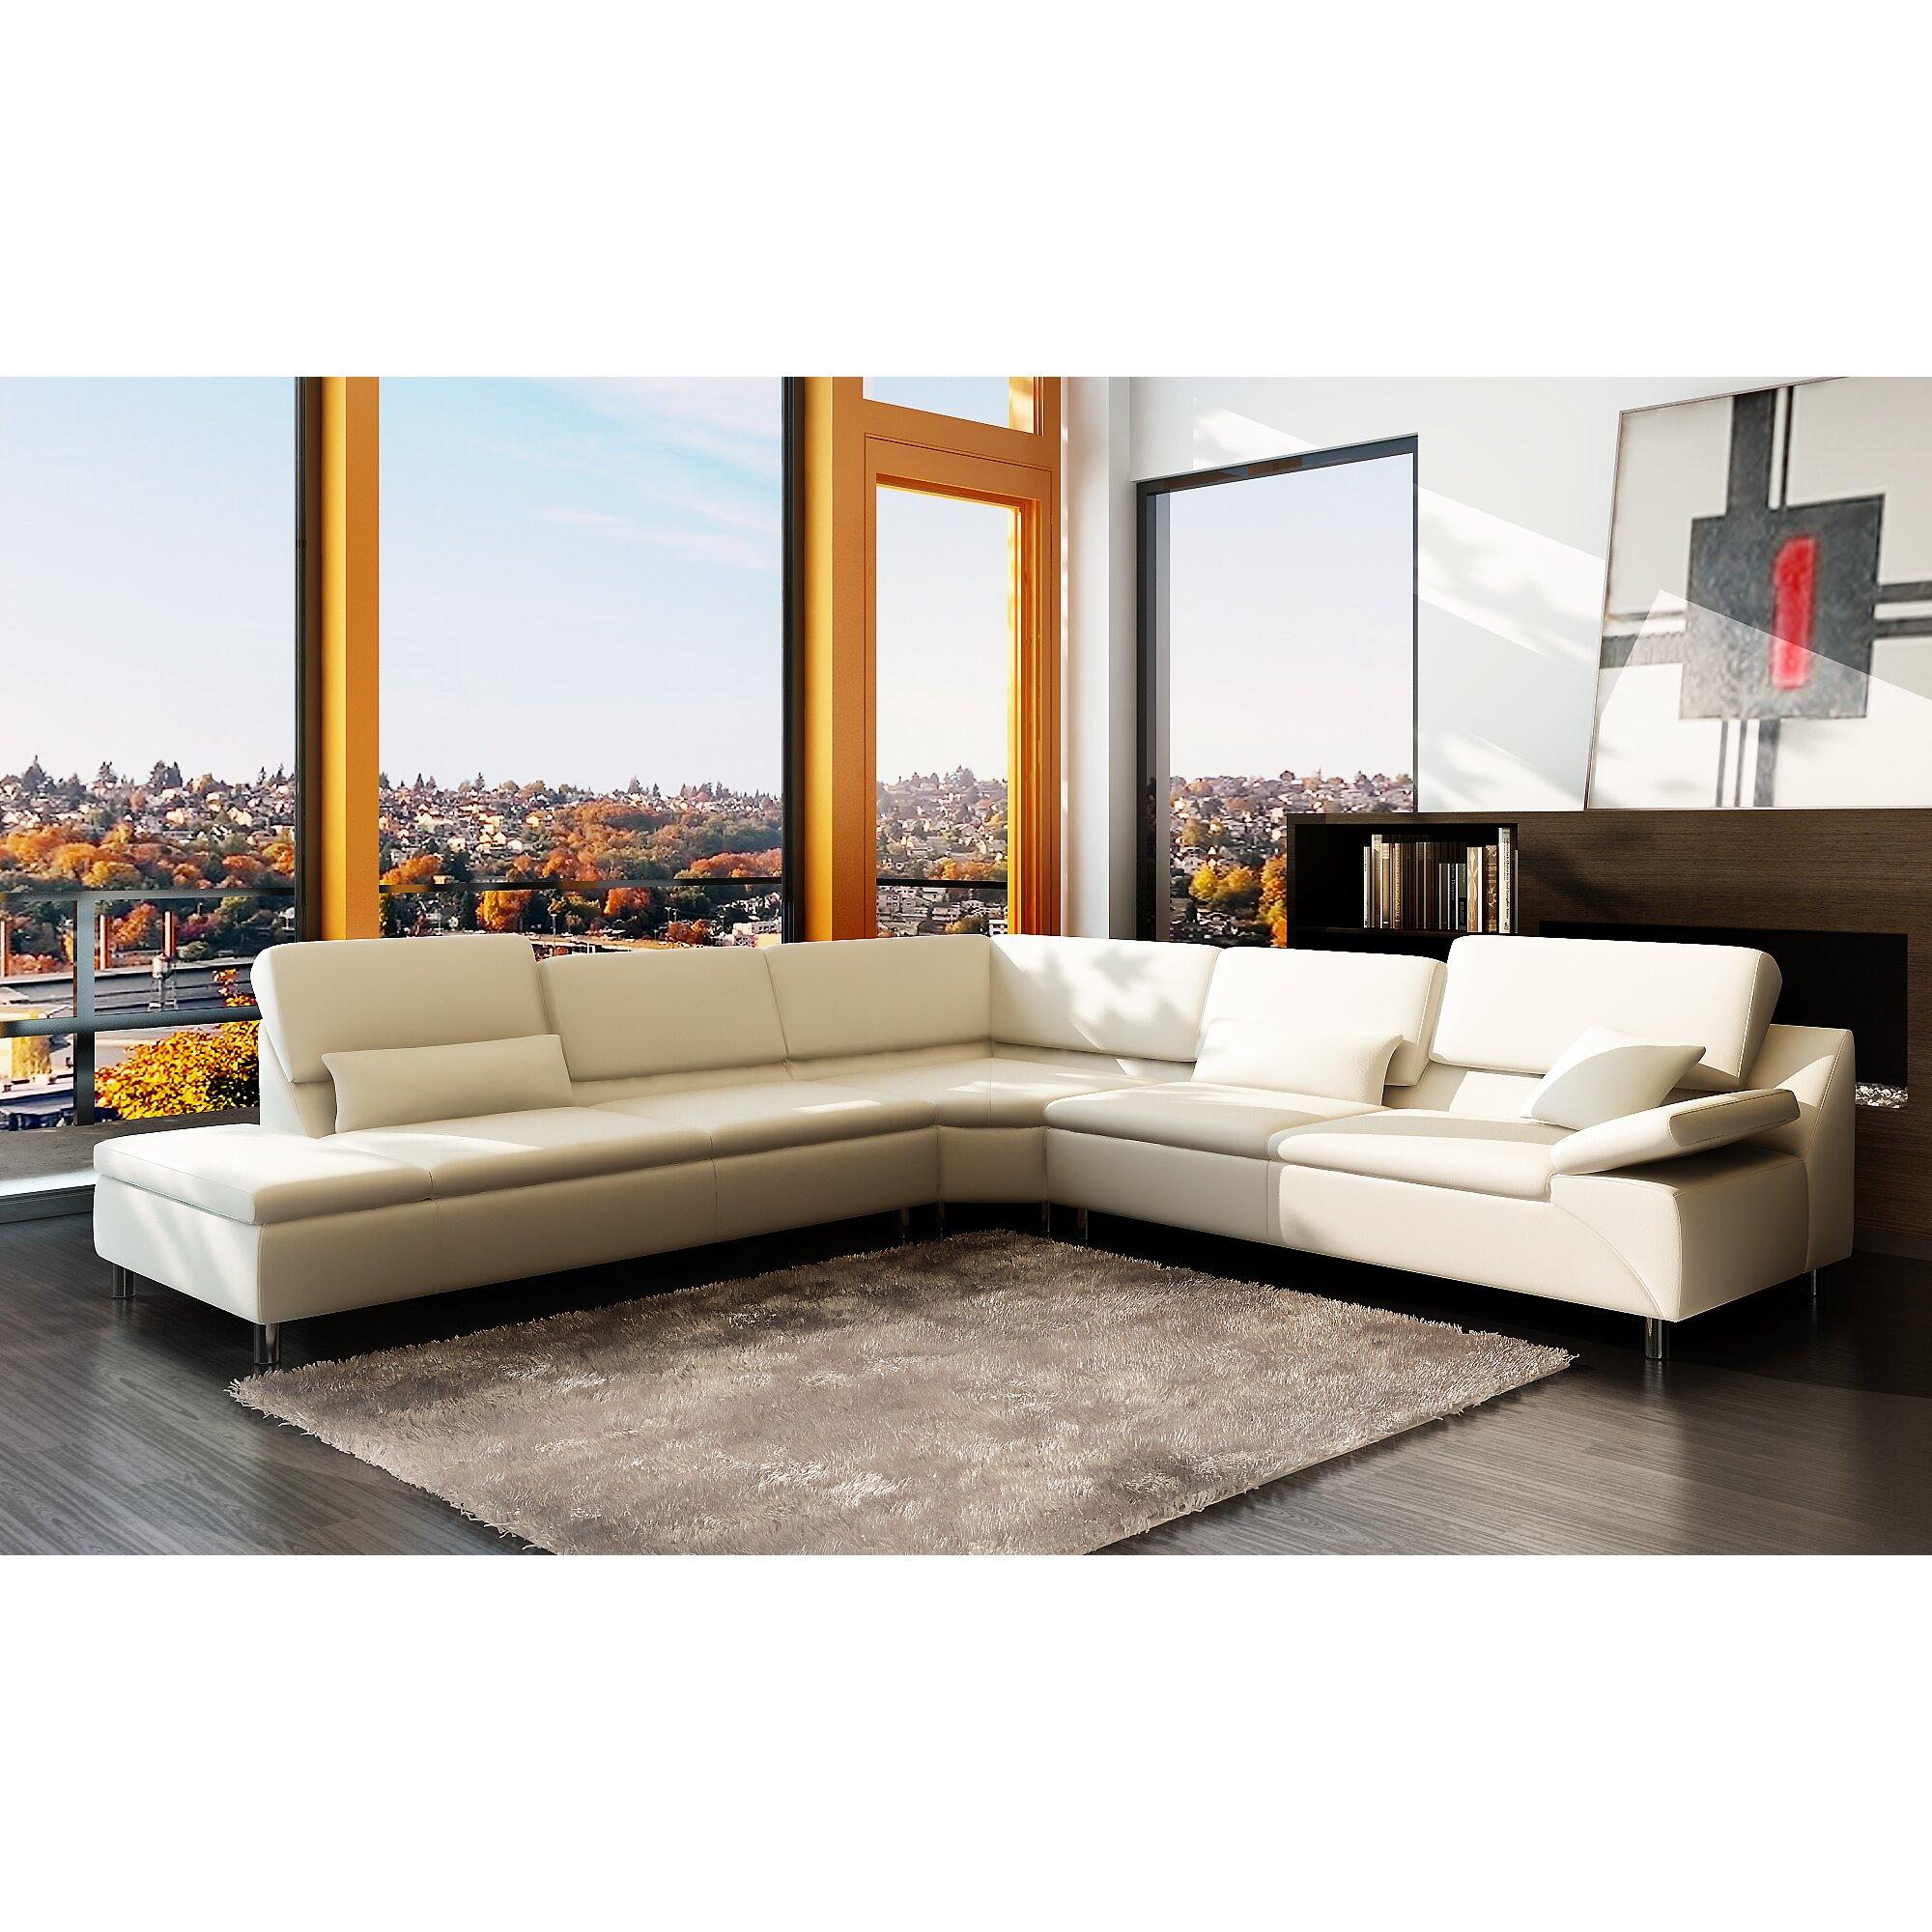 Hokku designs stanto elite sectional reviews for Hokku designs living room furniture